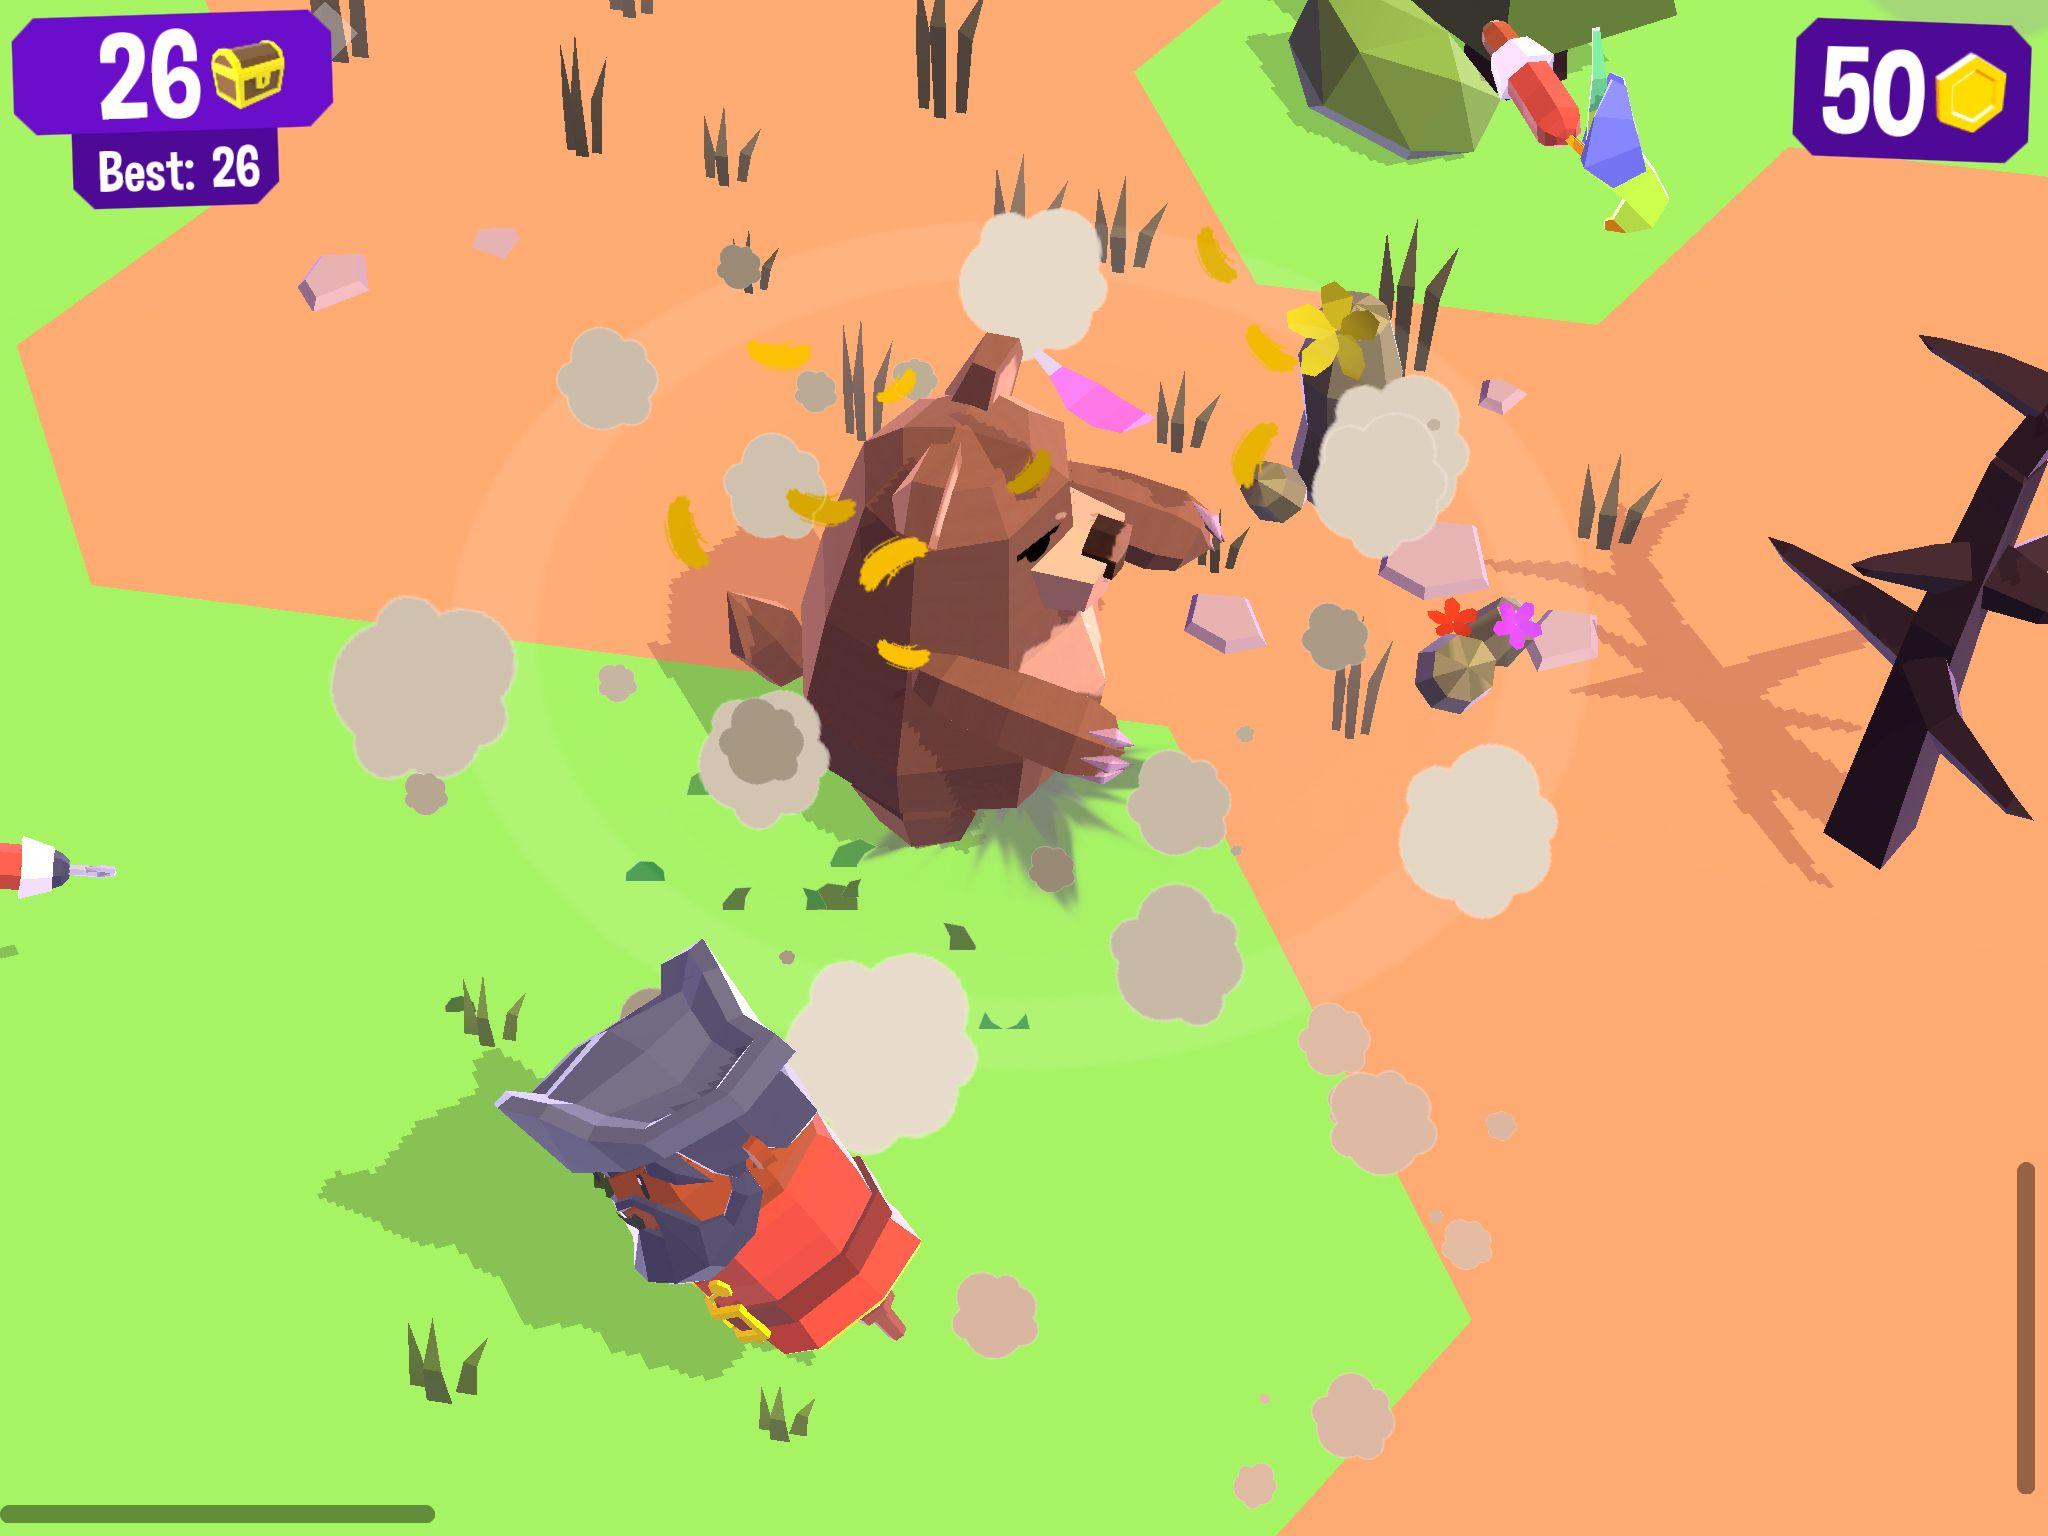 Pin by Fiona Liz Bugelli on Game's Land sliders, Sliders